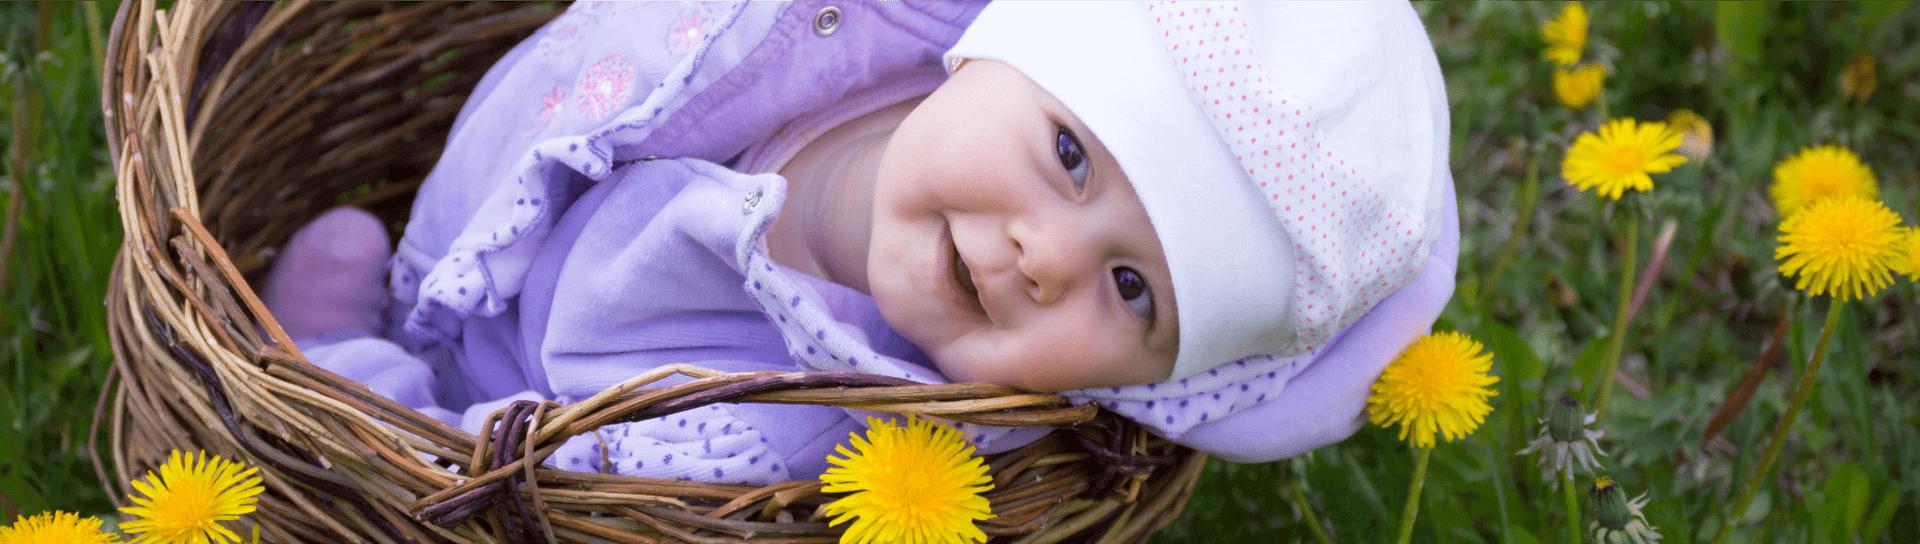 baby inside the basket